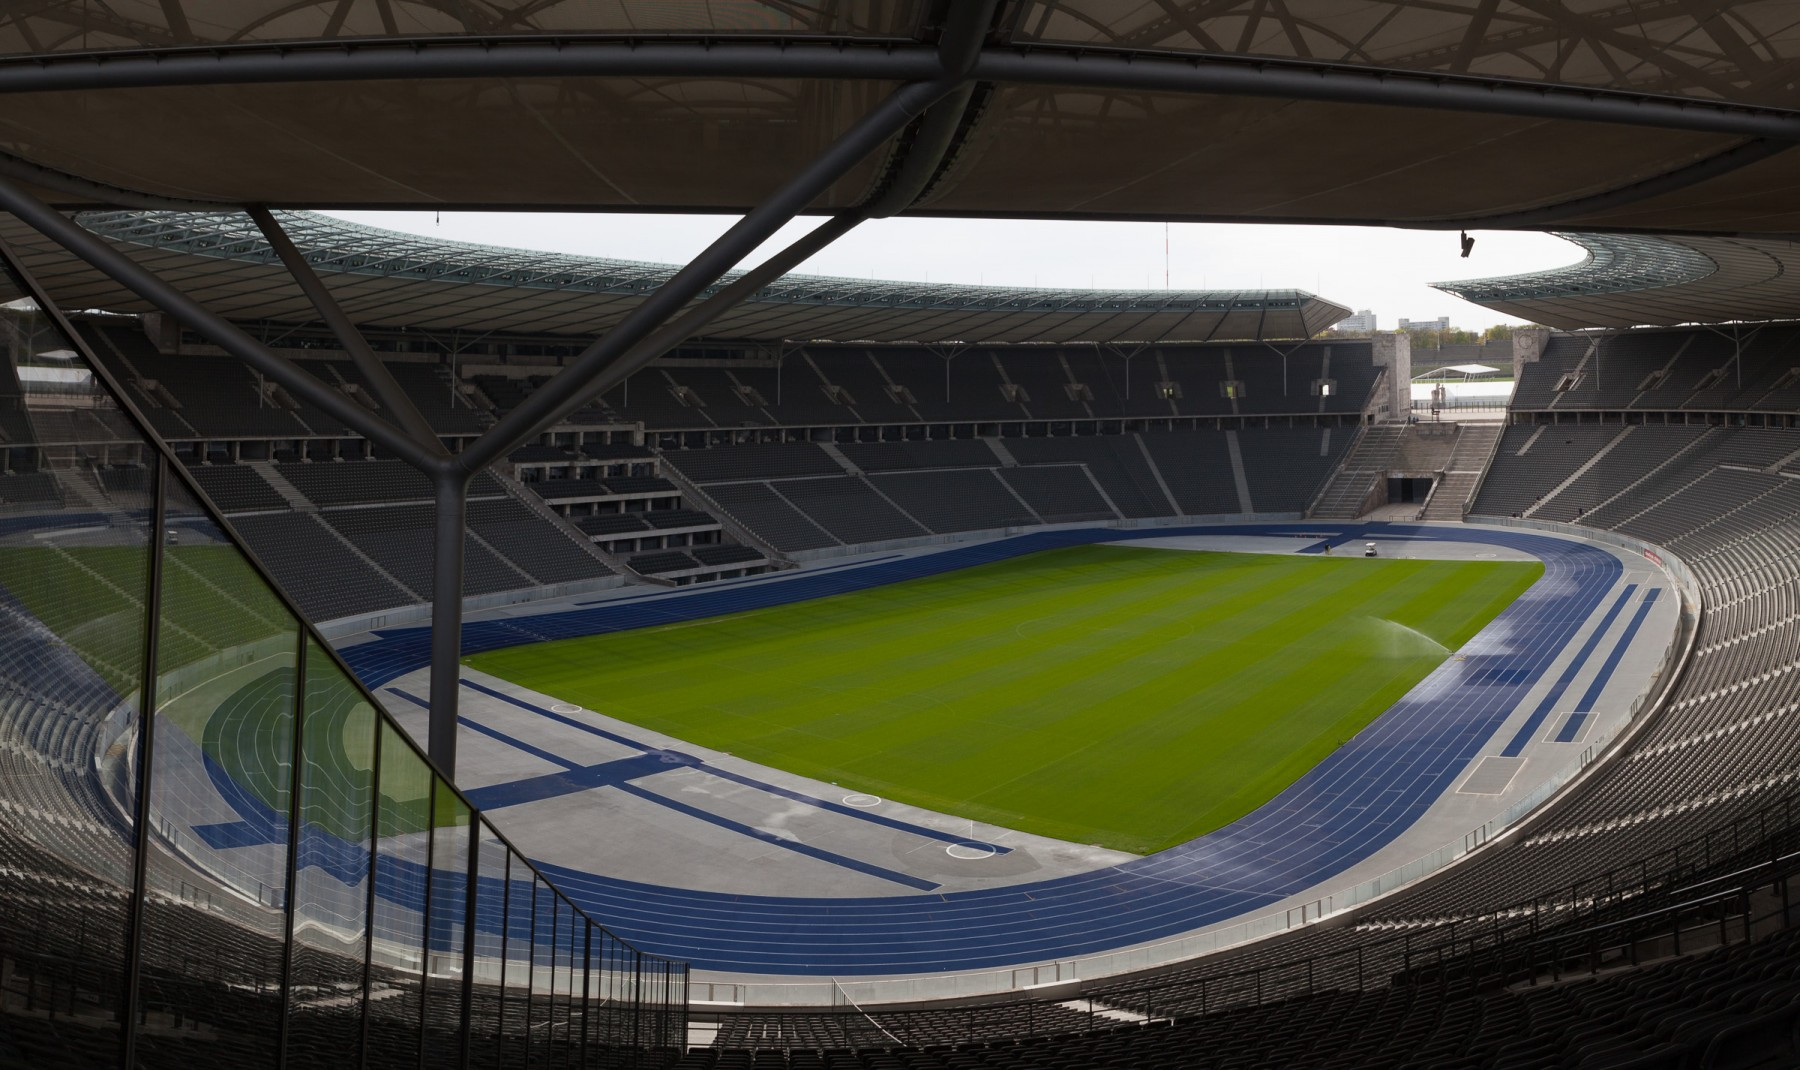 Olympiastadion grandstands